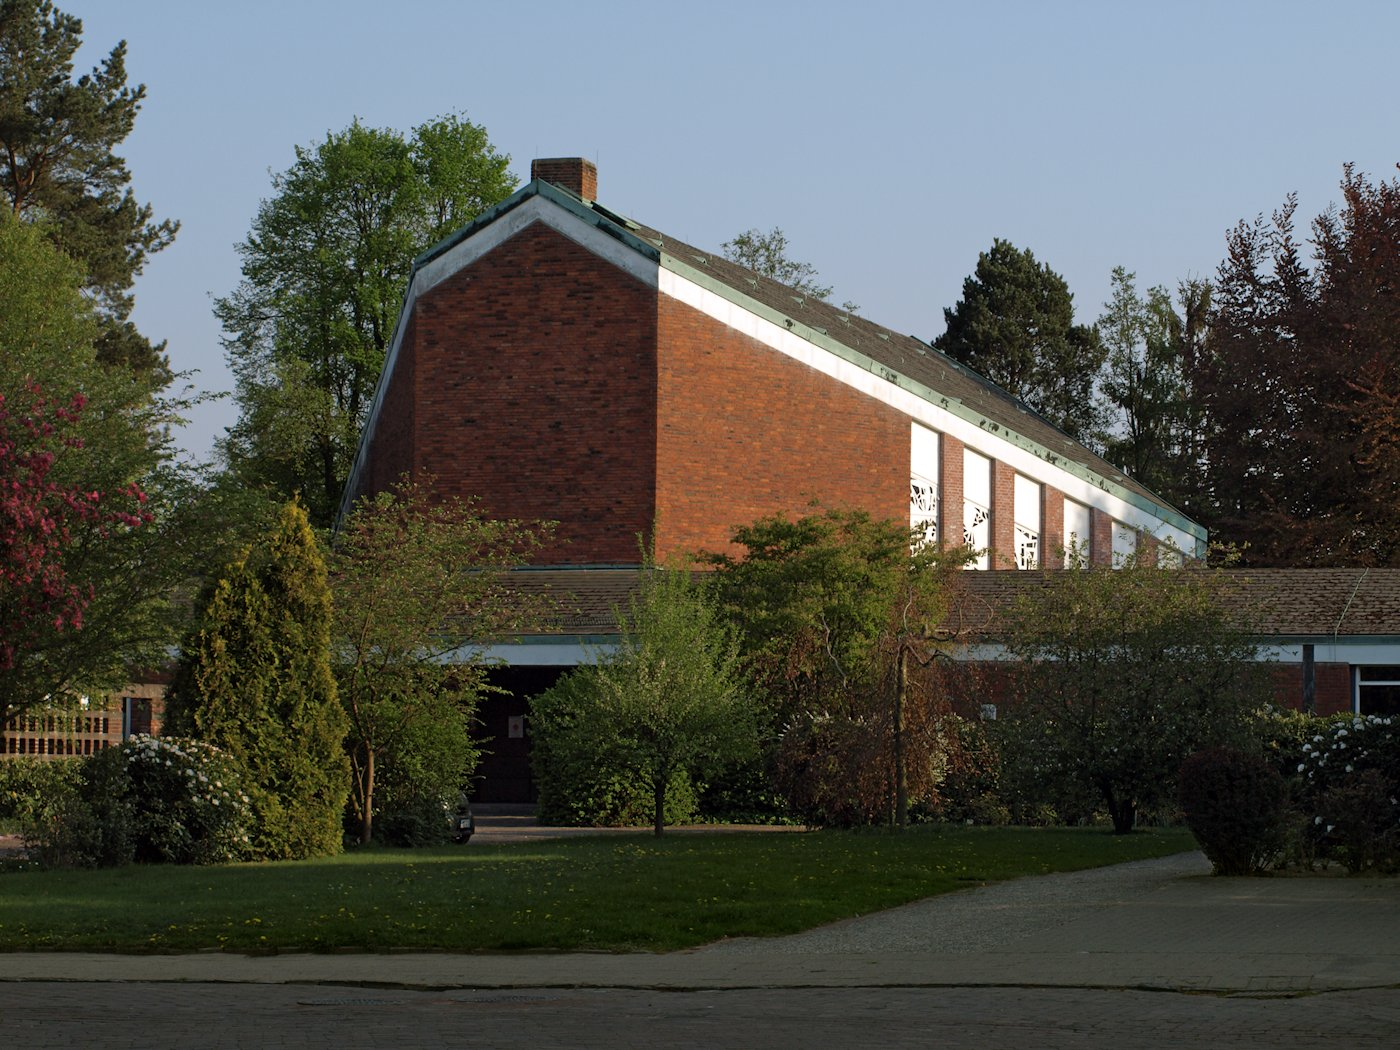 Datei:Pinneberg Heilig-Geist-Kirche.jpg – Wikipedia